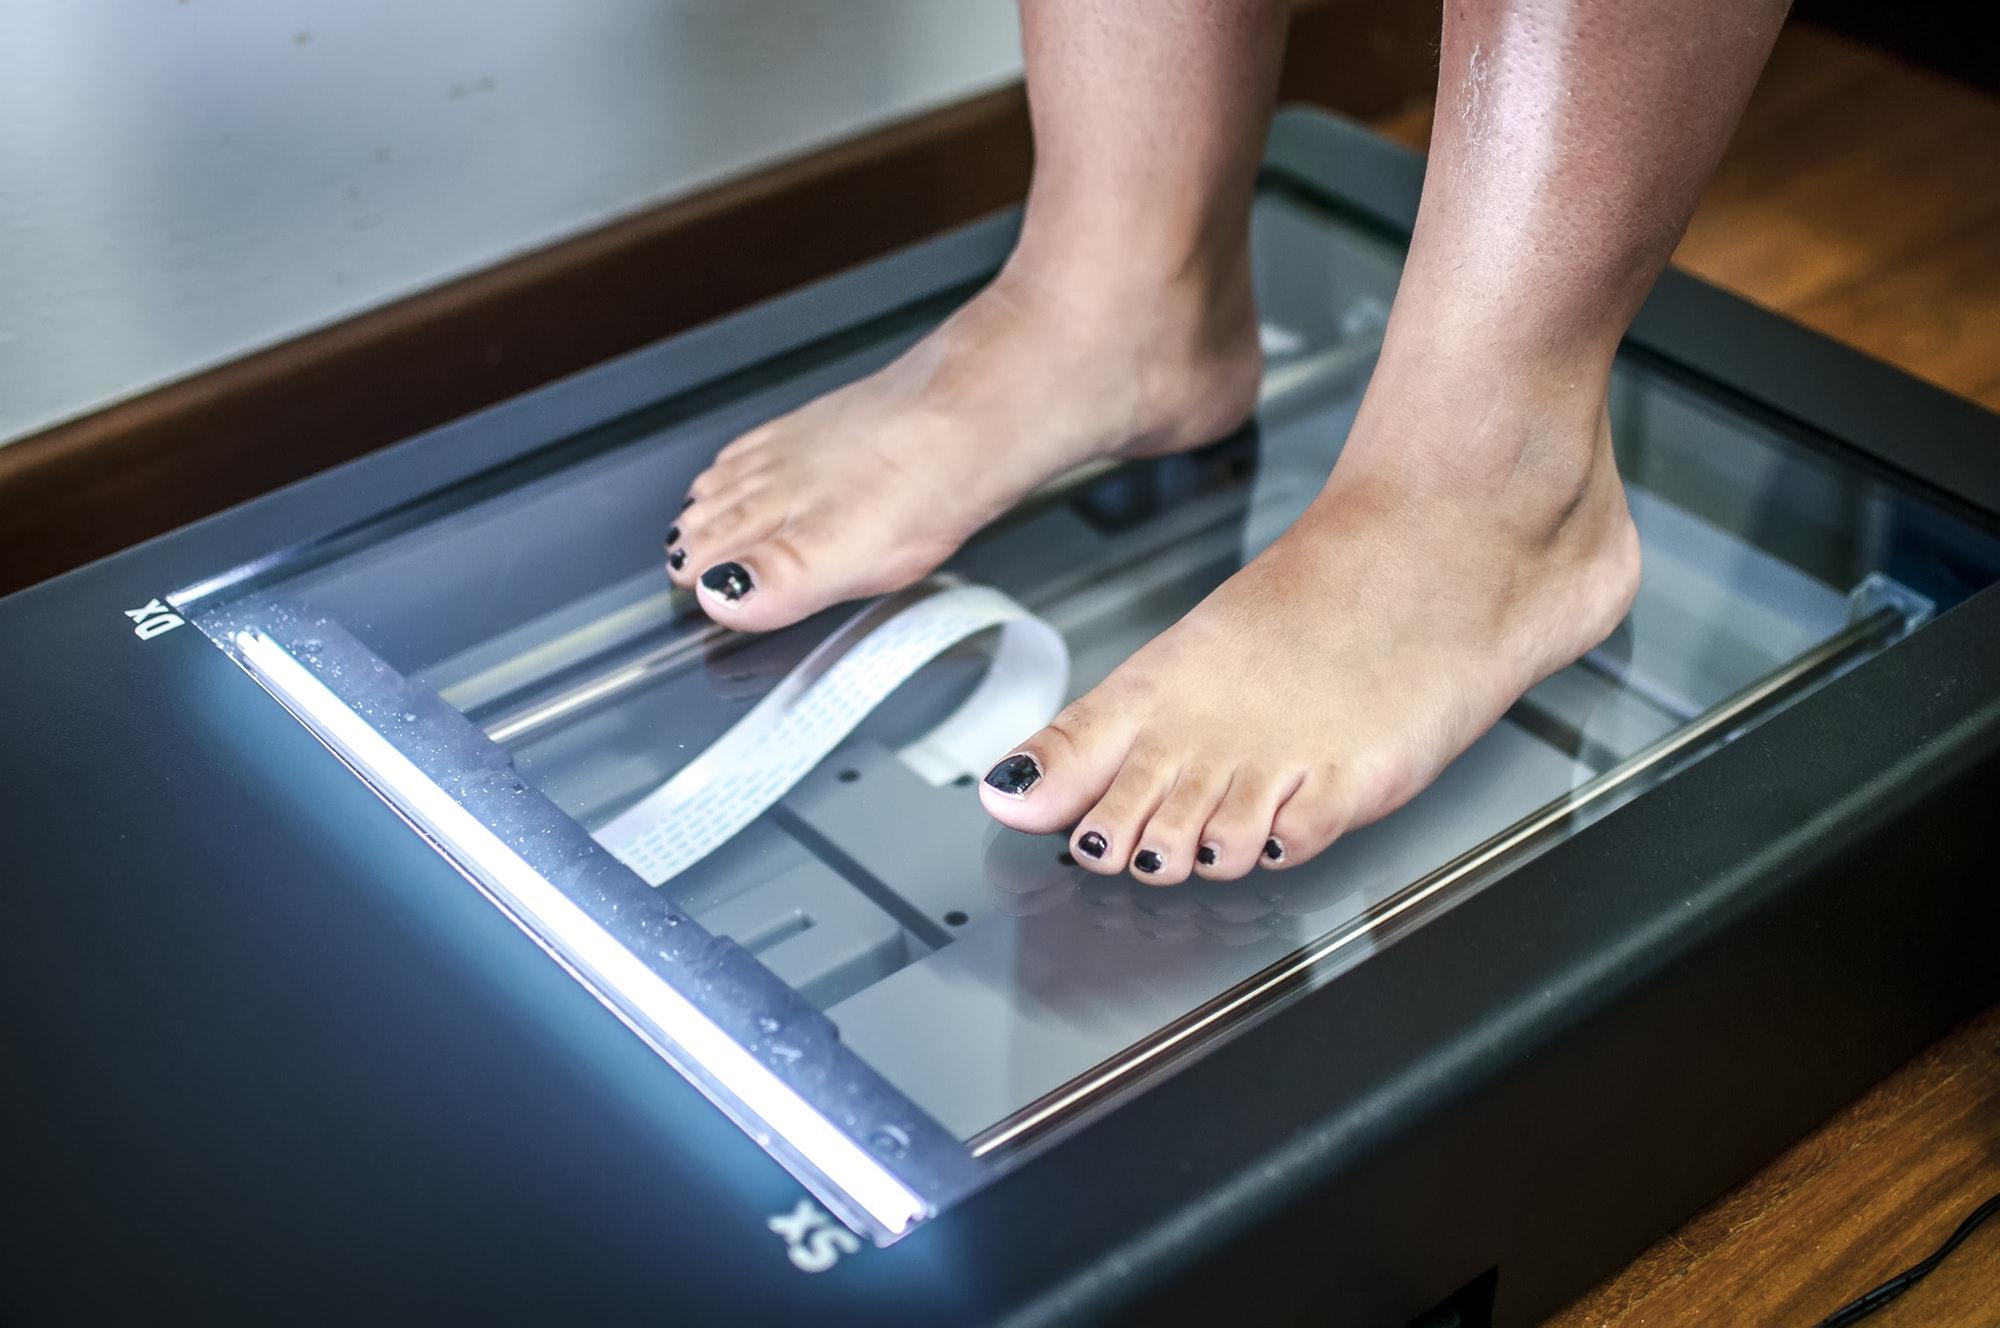 Feet scanning